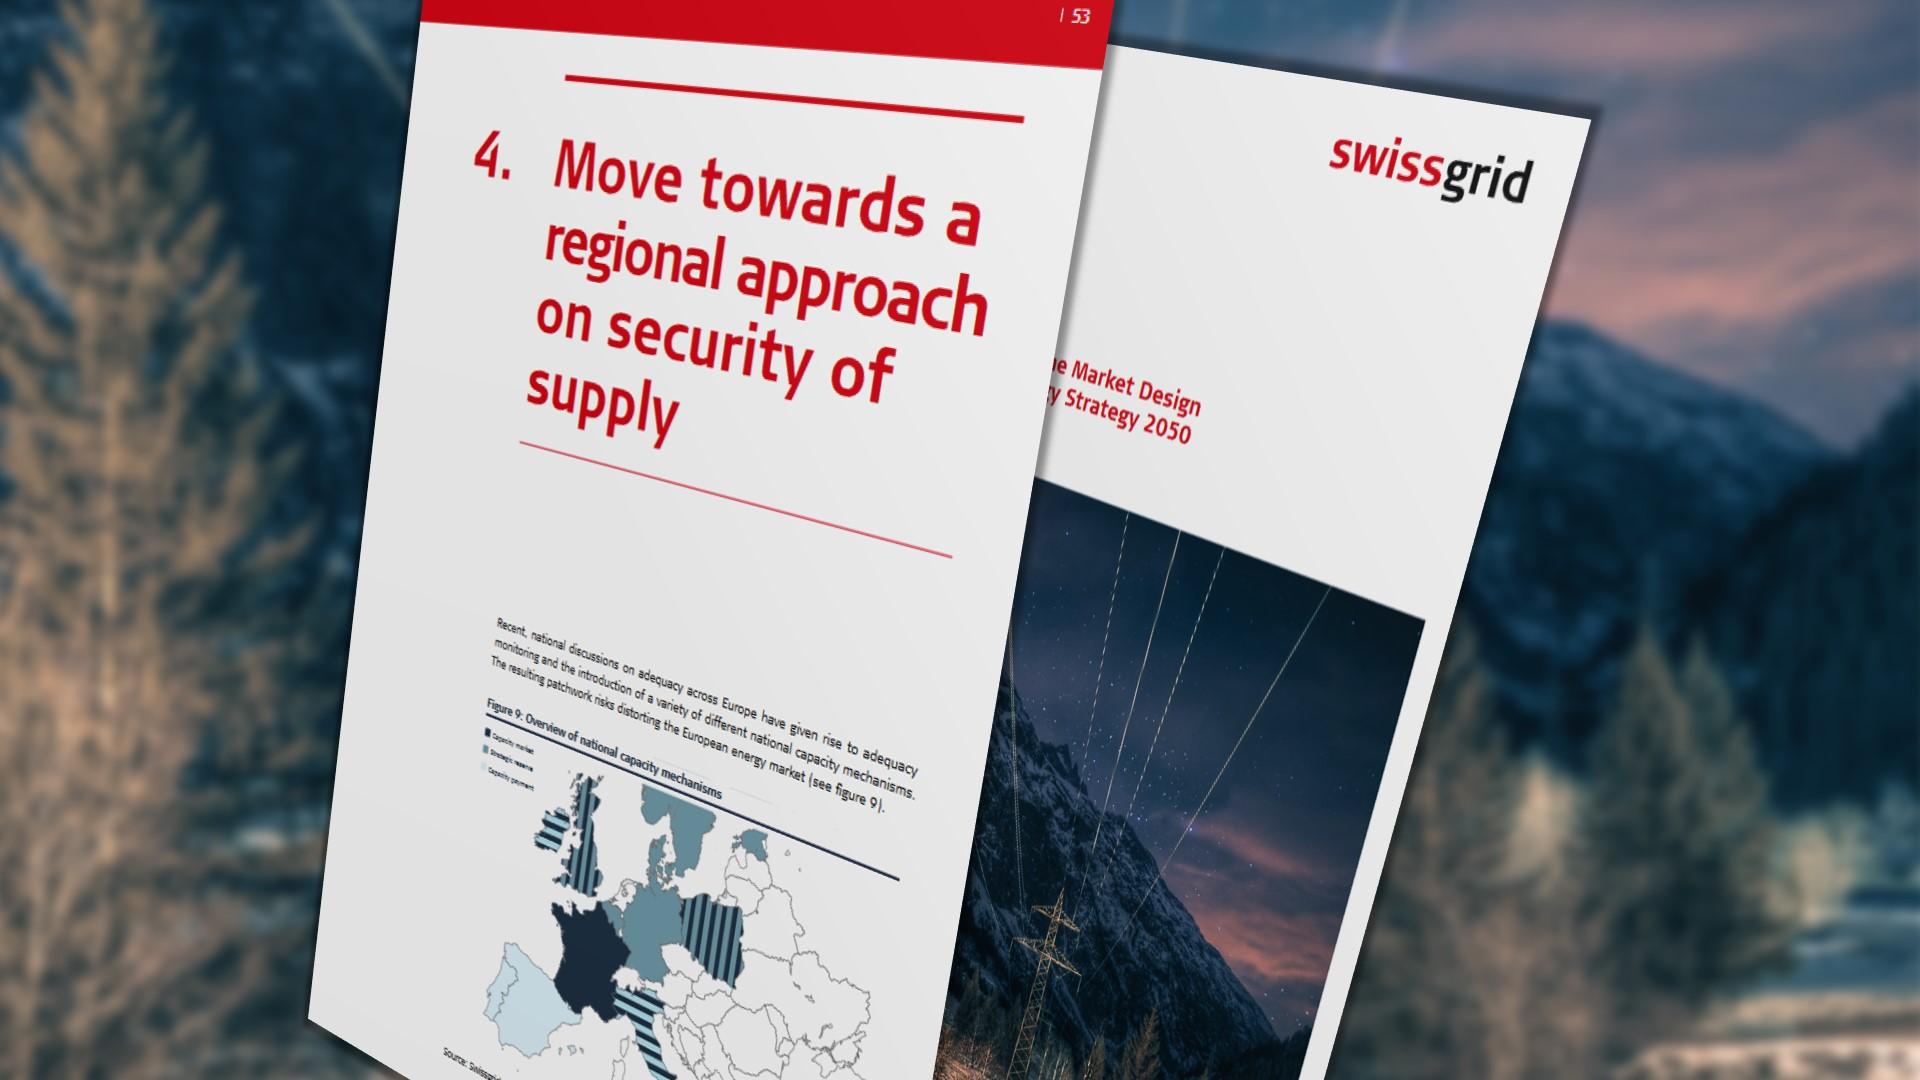 Swissgrid proposals taken into debate